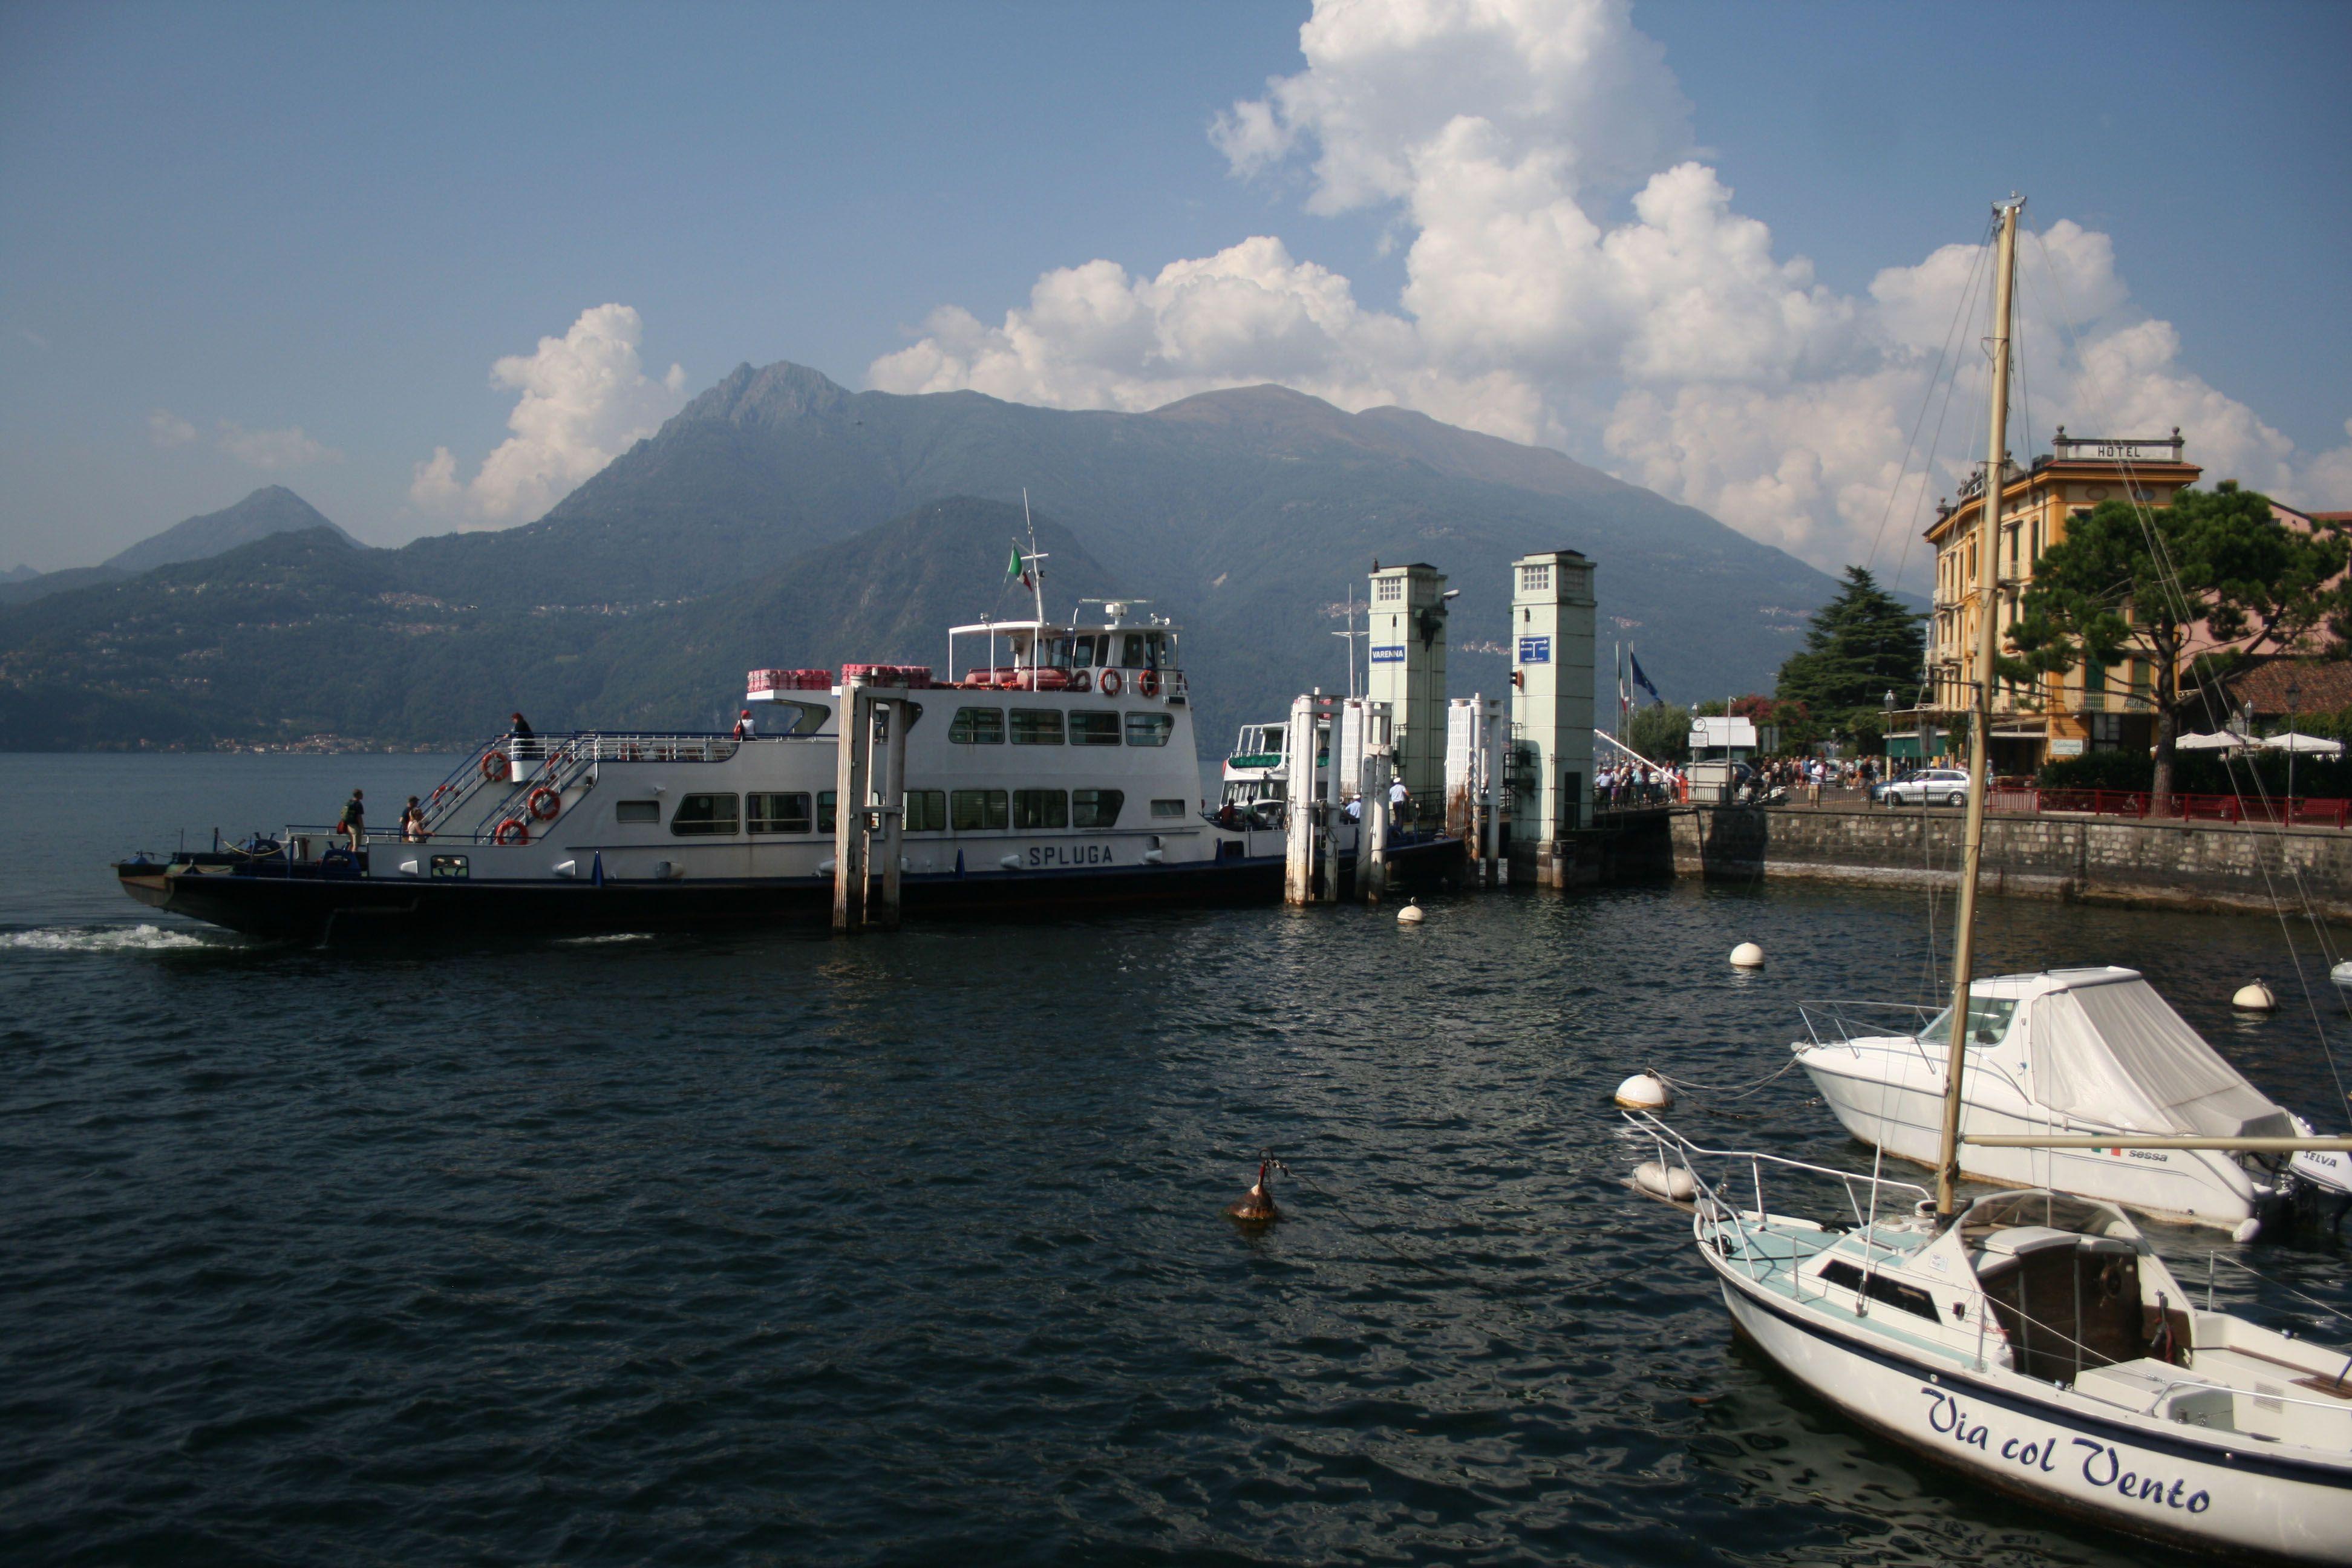 Disembarking From Car Ferry Spluga At Varenna On Lake Como